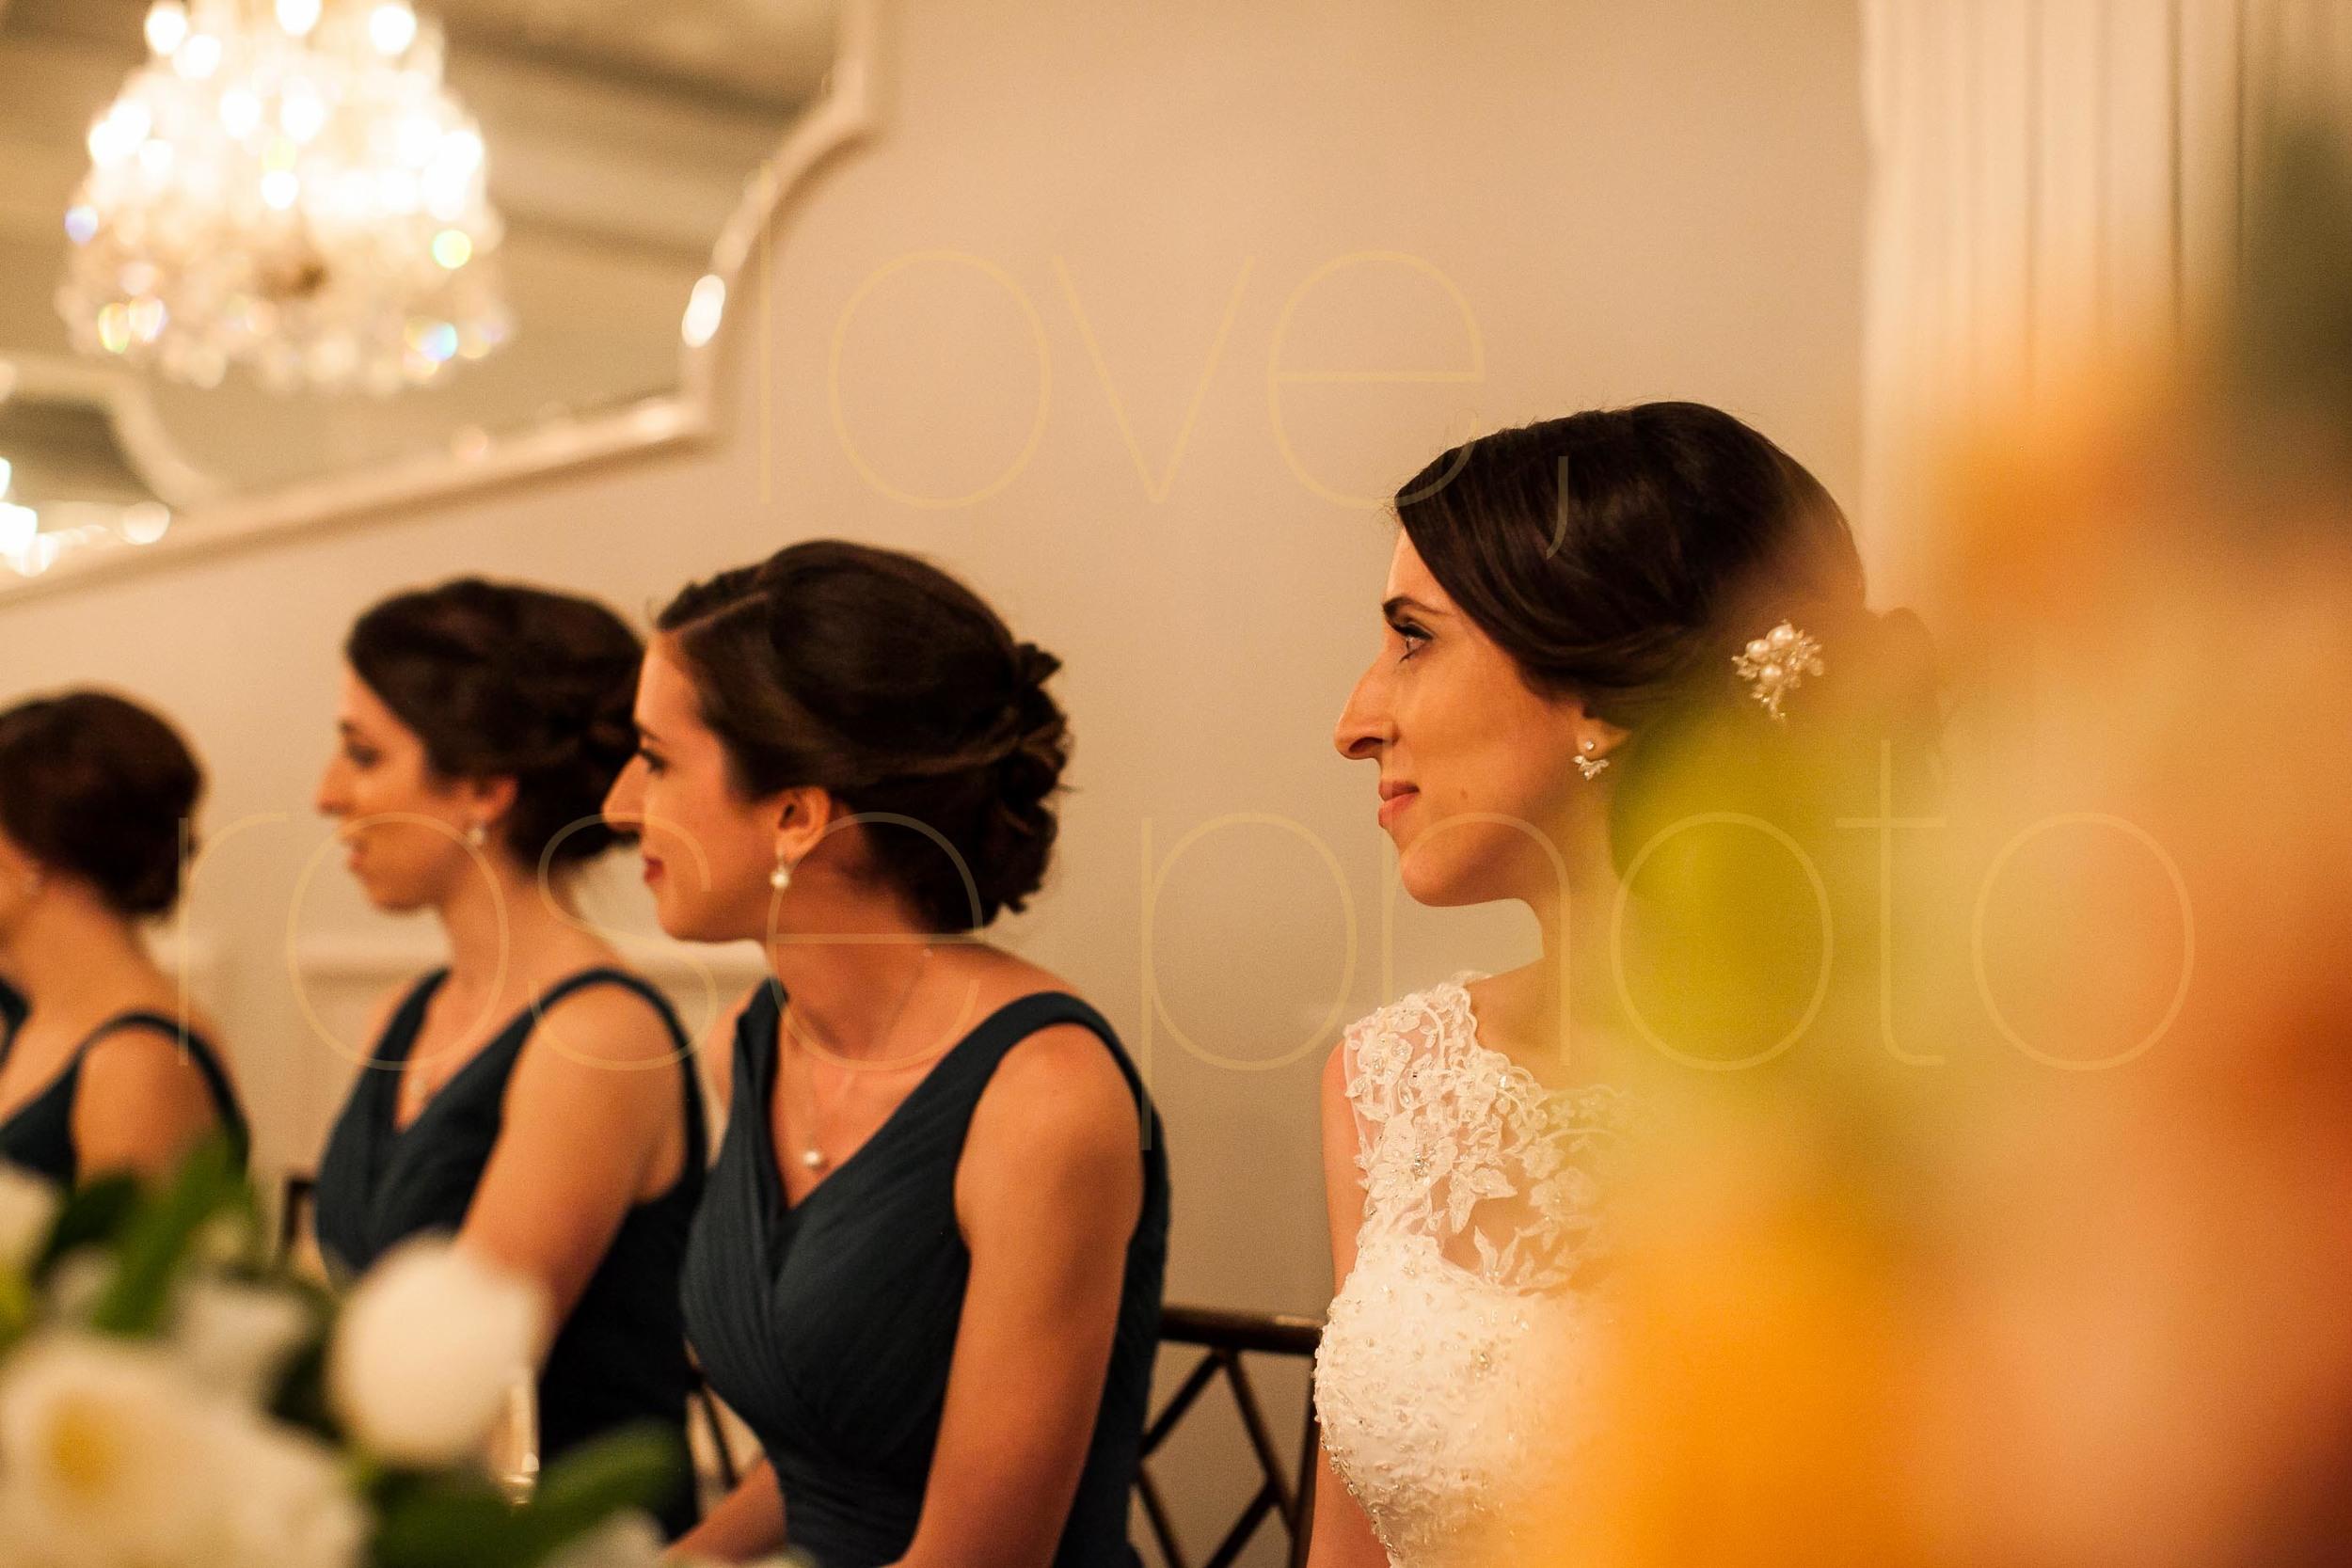 K Bianci maple chaple summer wedding chicago photographer -0366.jpg